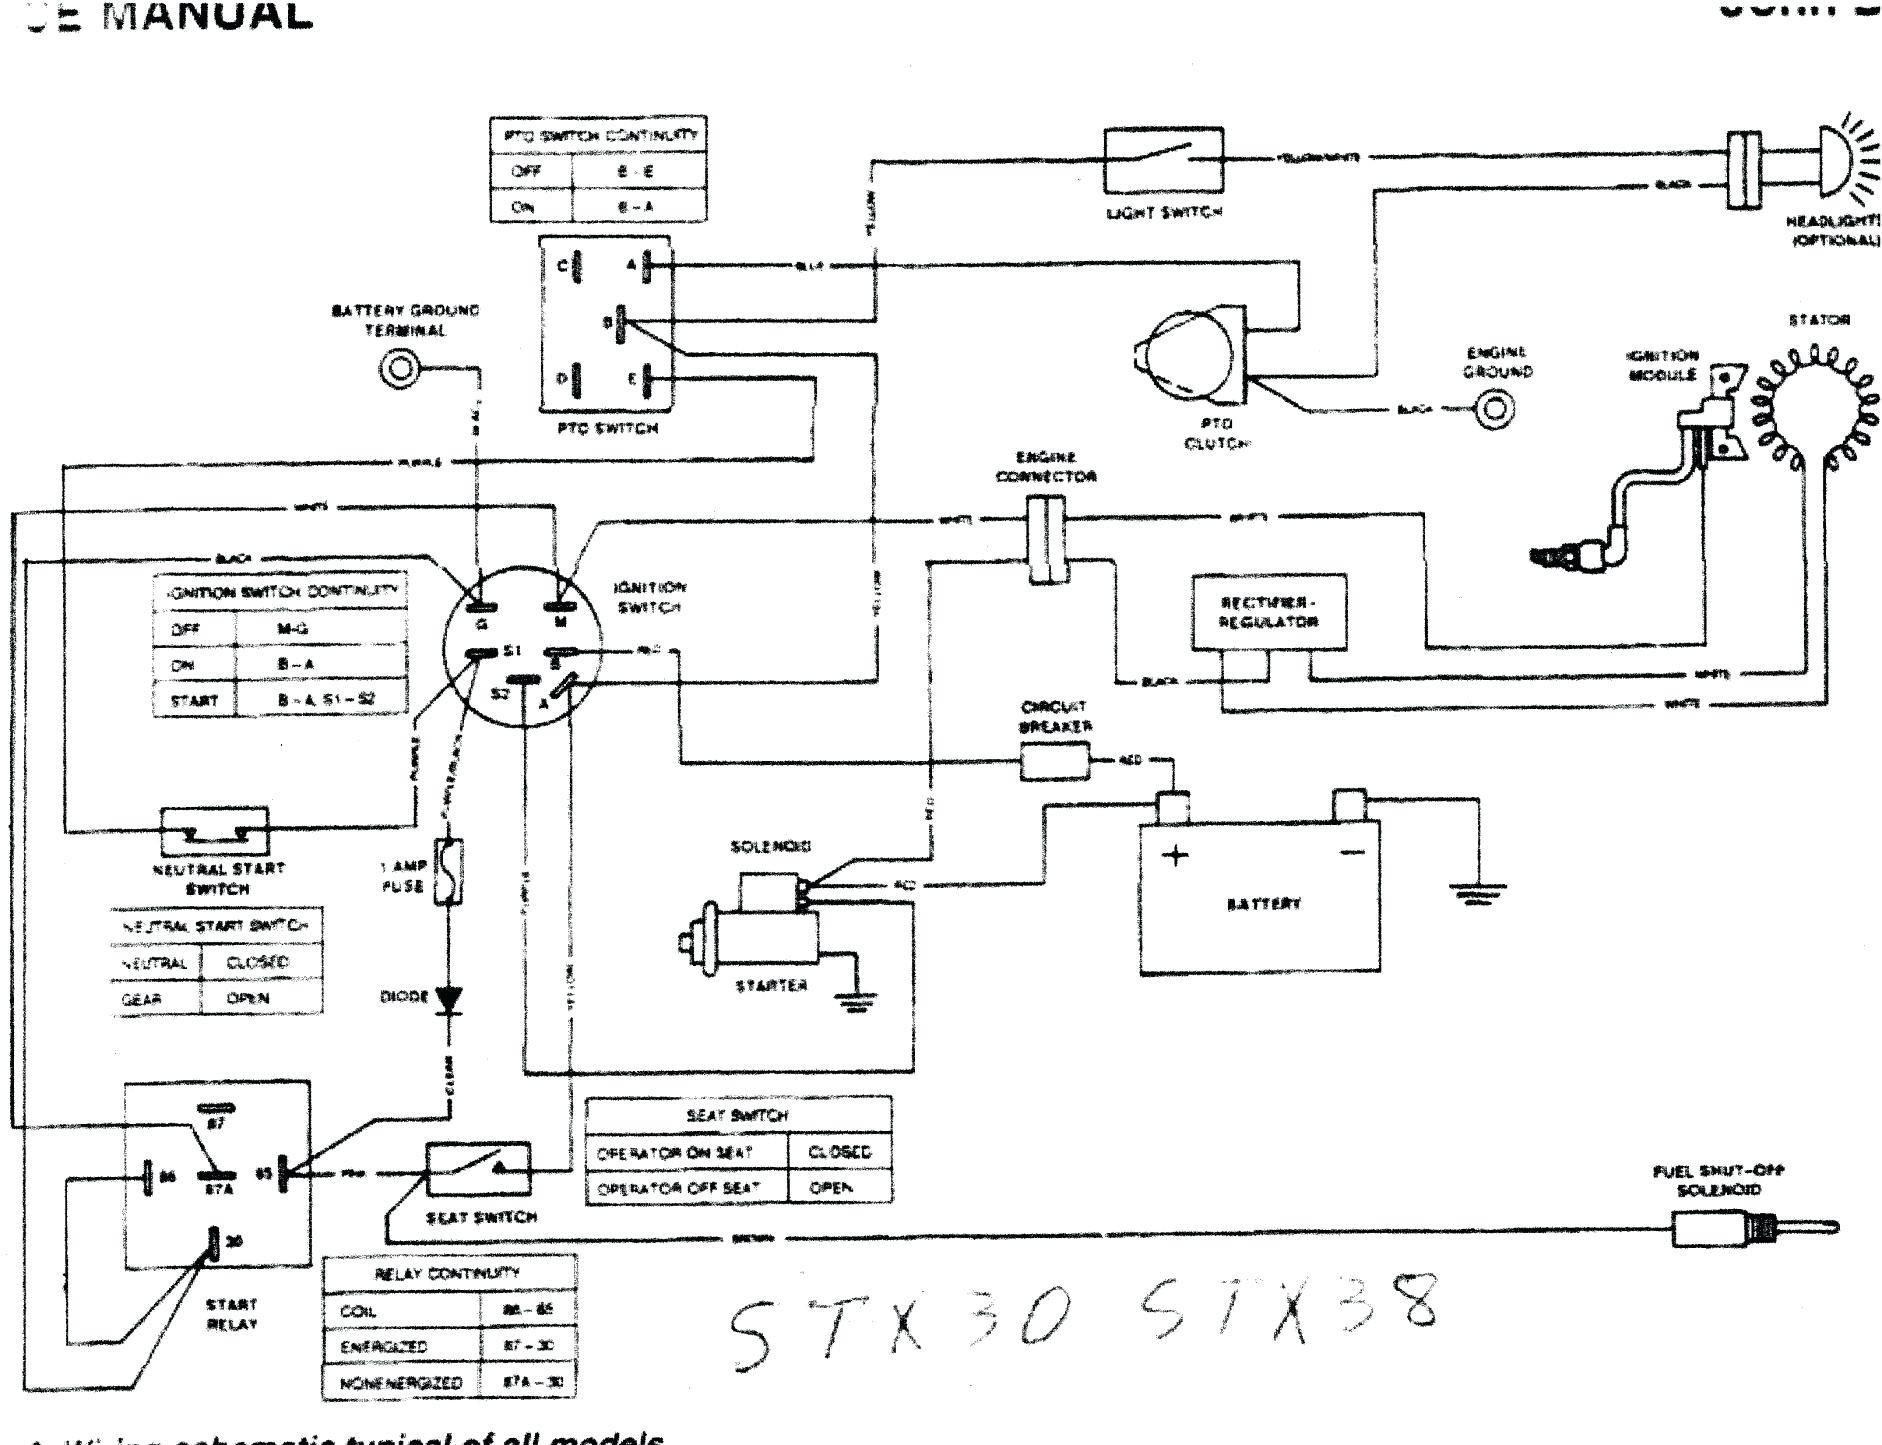 Xw 2073 John Deere 4440 Wiring Schematic Wiring Diagram